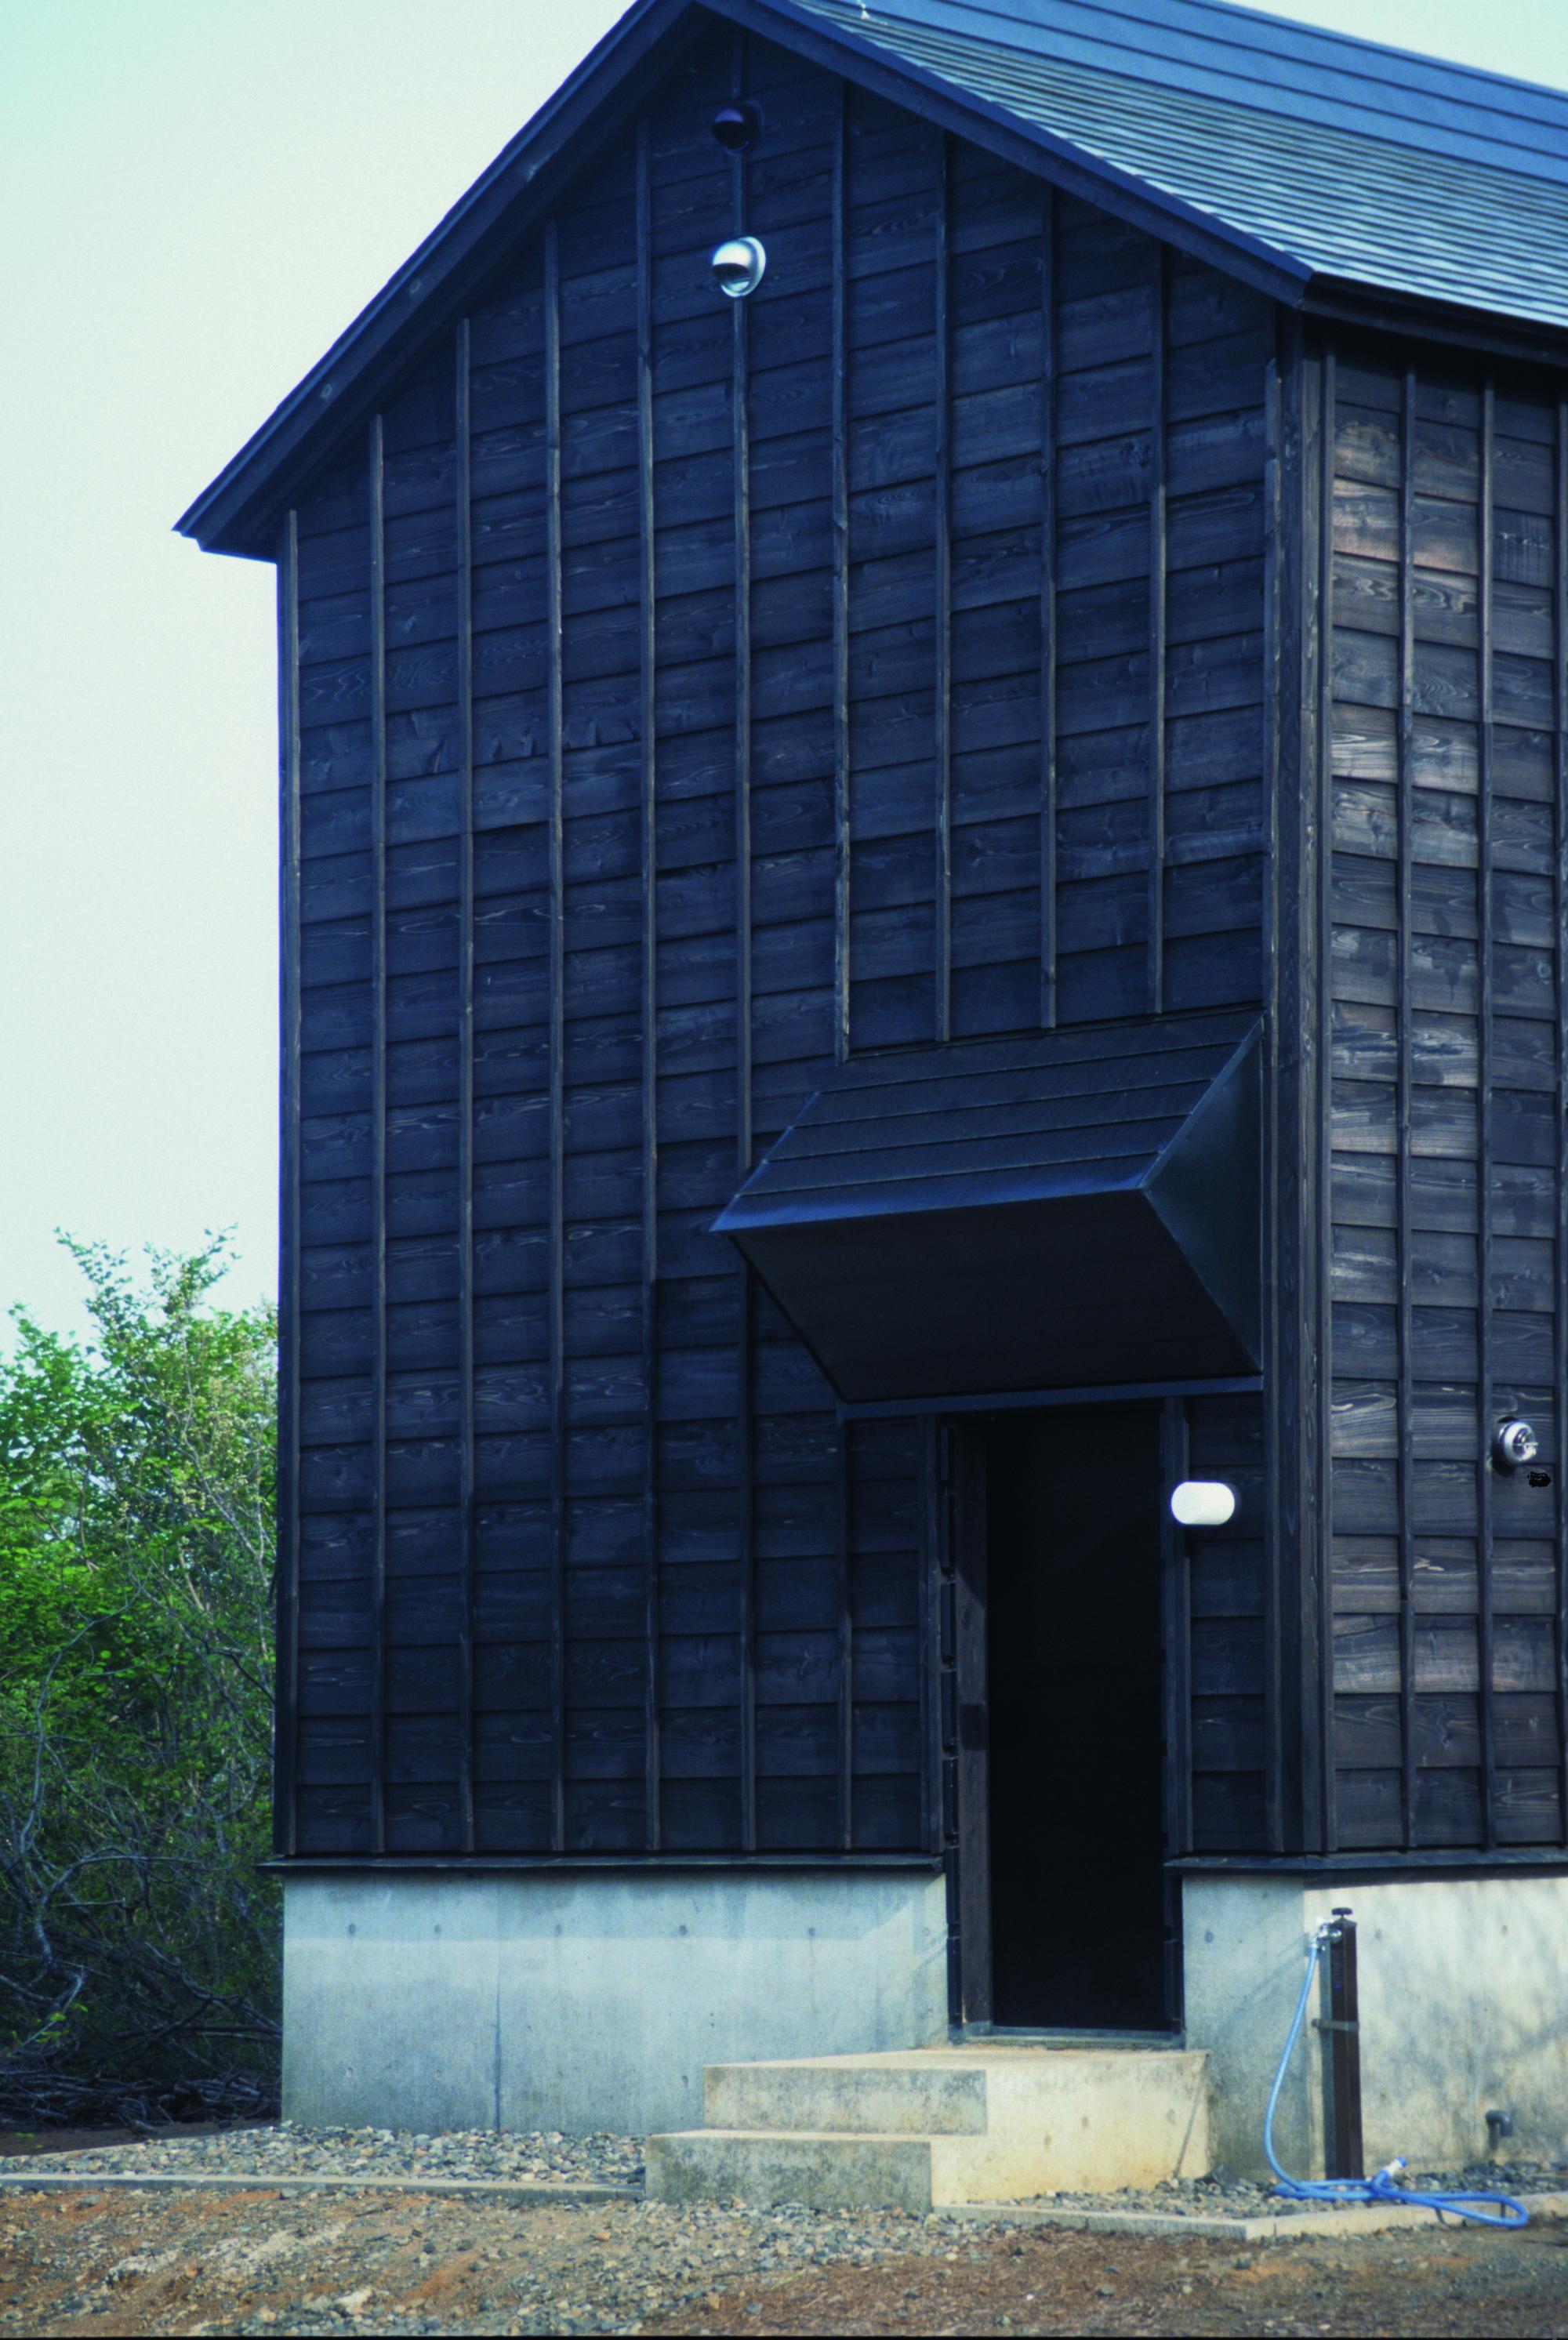 gallery of cottage in tsumari daigo ishii future scape architects 5. Black Bedroom Furniture Sets. Home Design Ideas